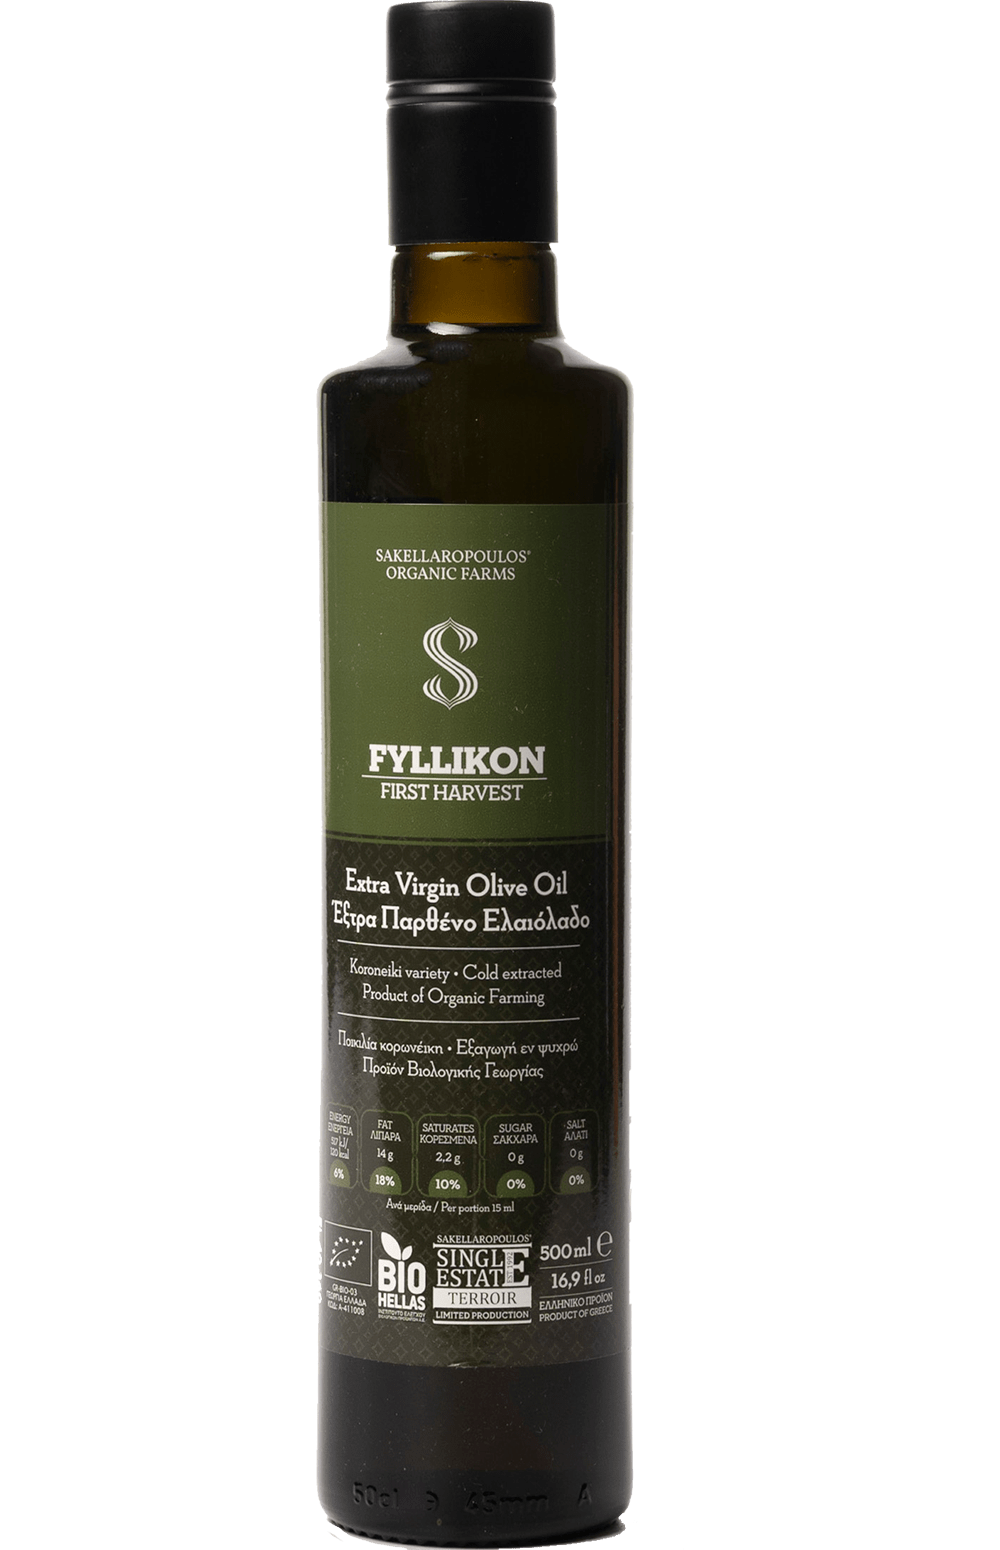 Fyllikon First Harvest Organic EVOO